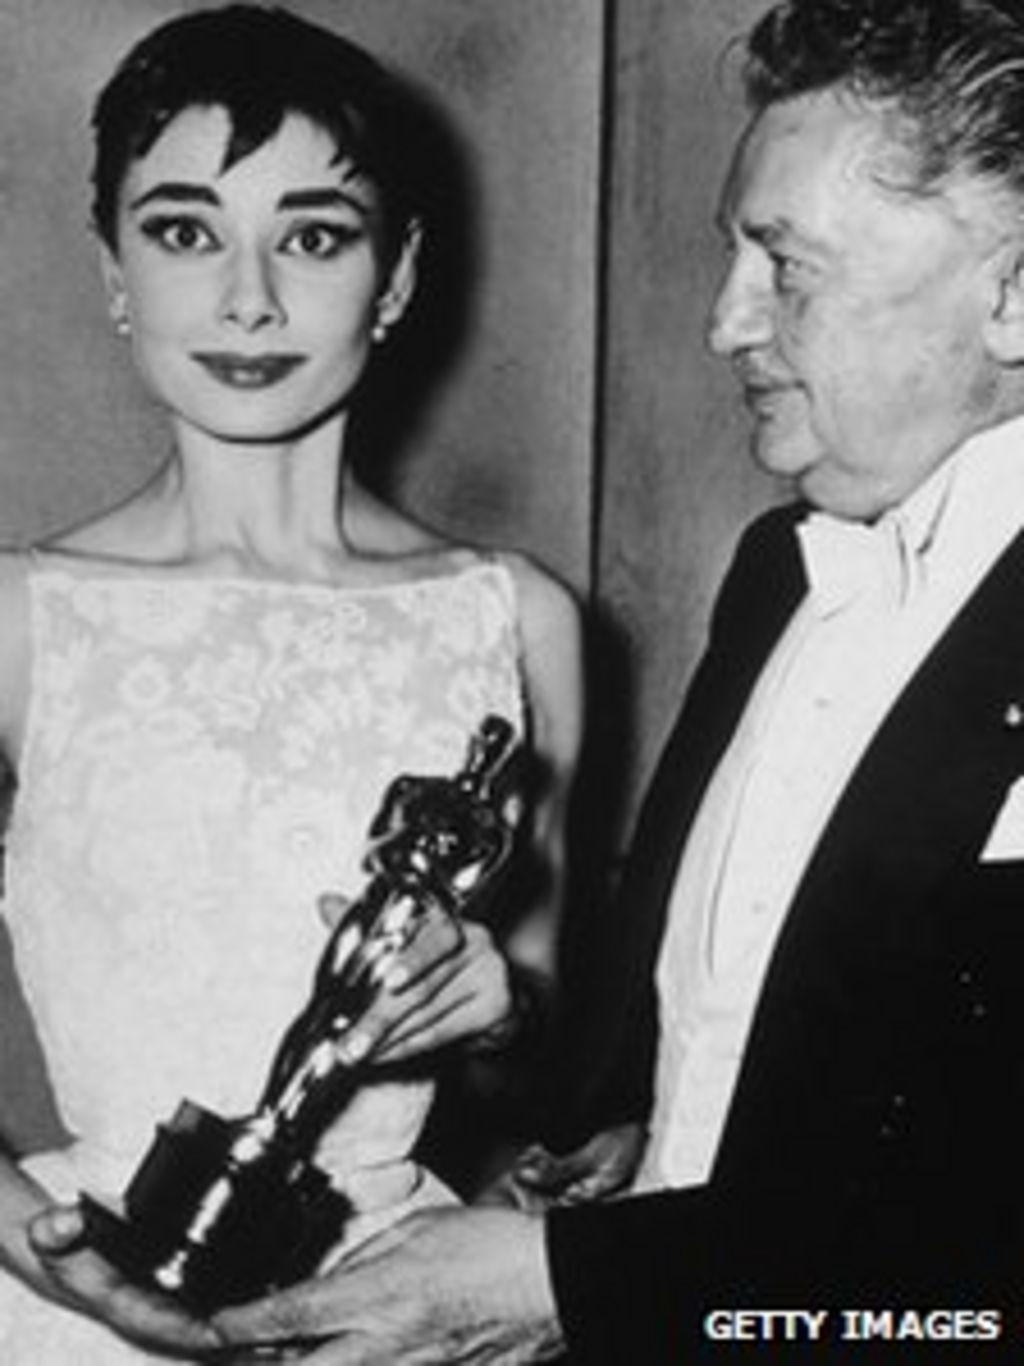 Audrey Hepburn Roman Holiday Dress To Go On Sale Bbc News